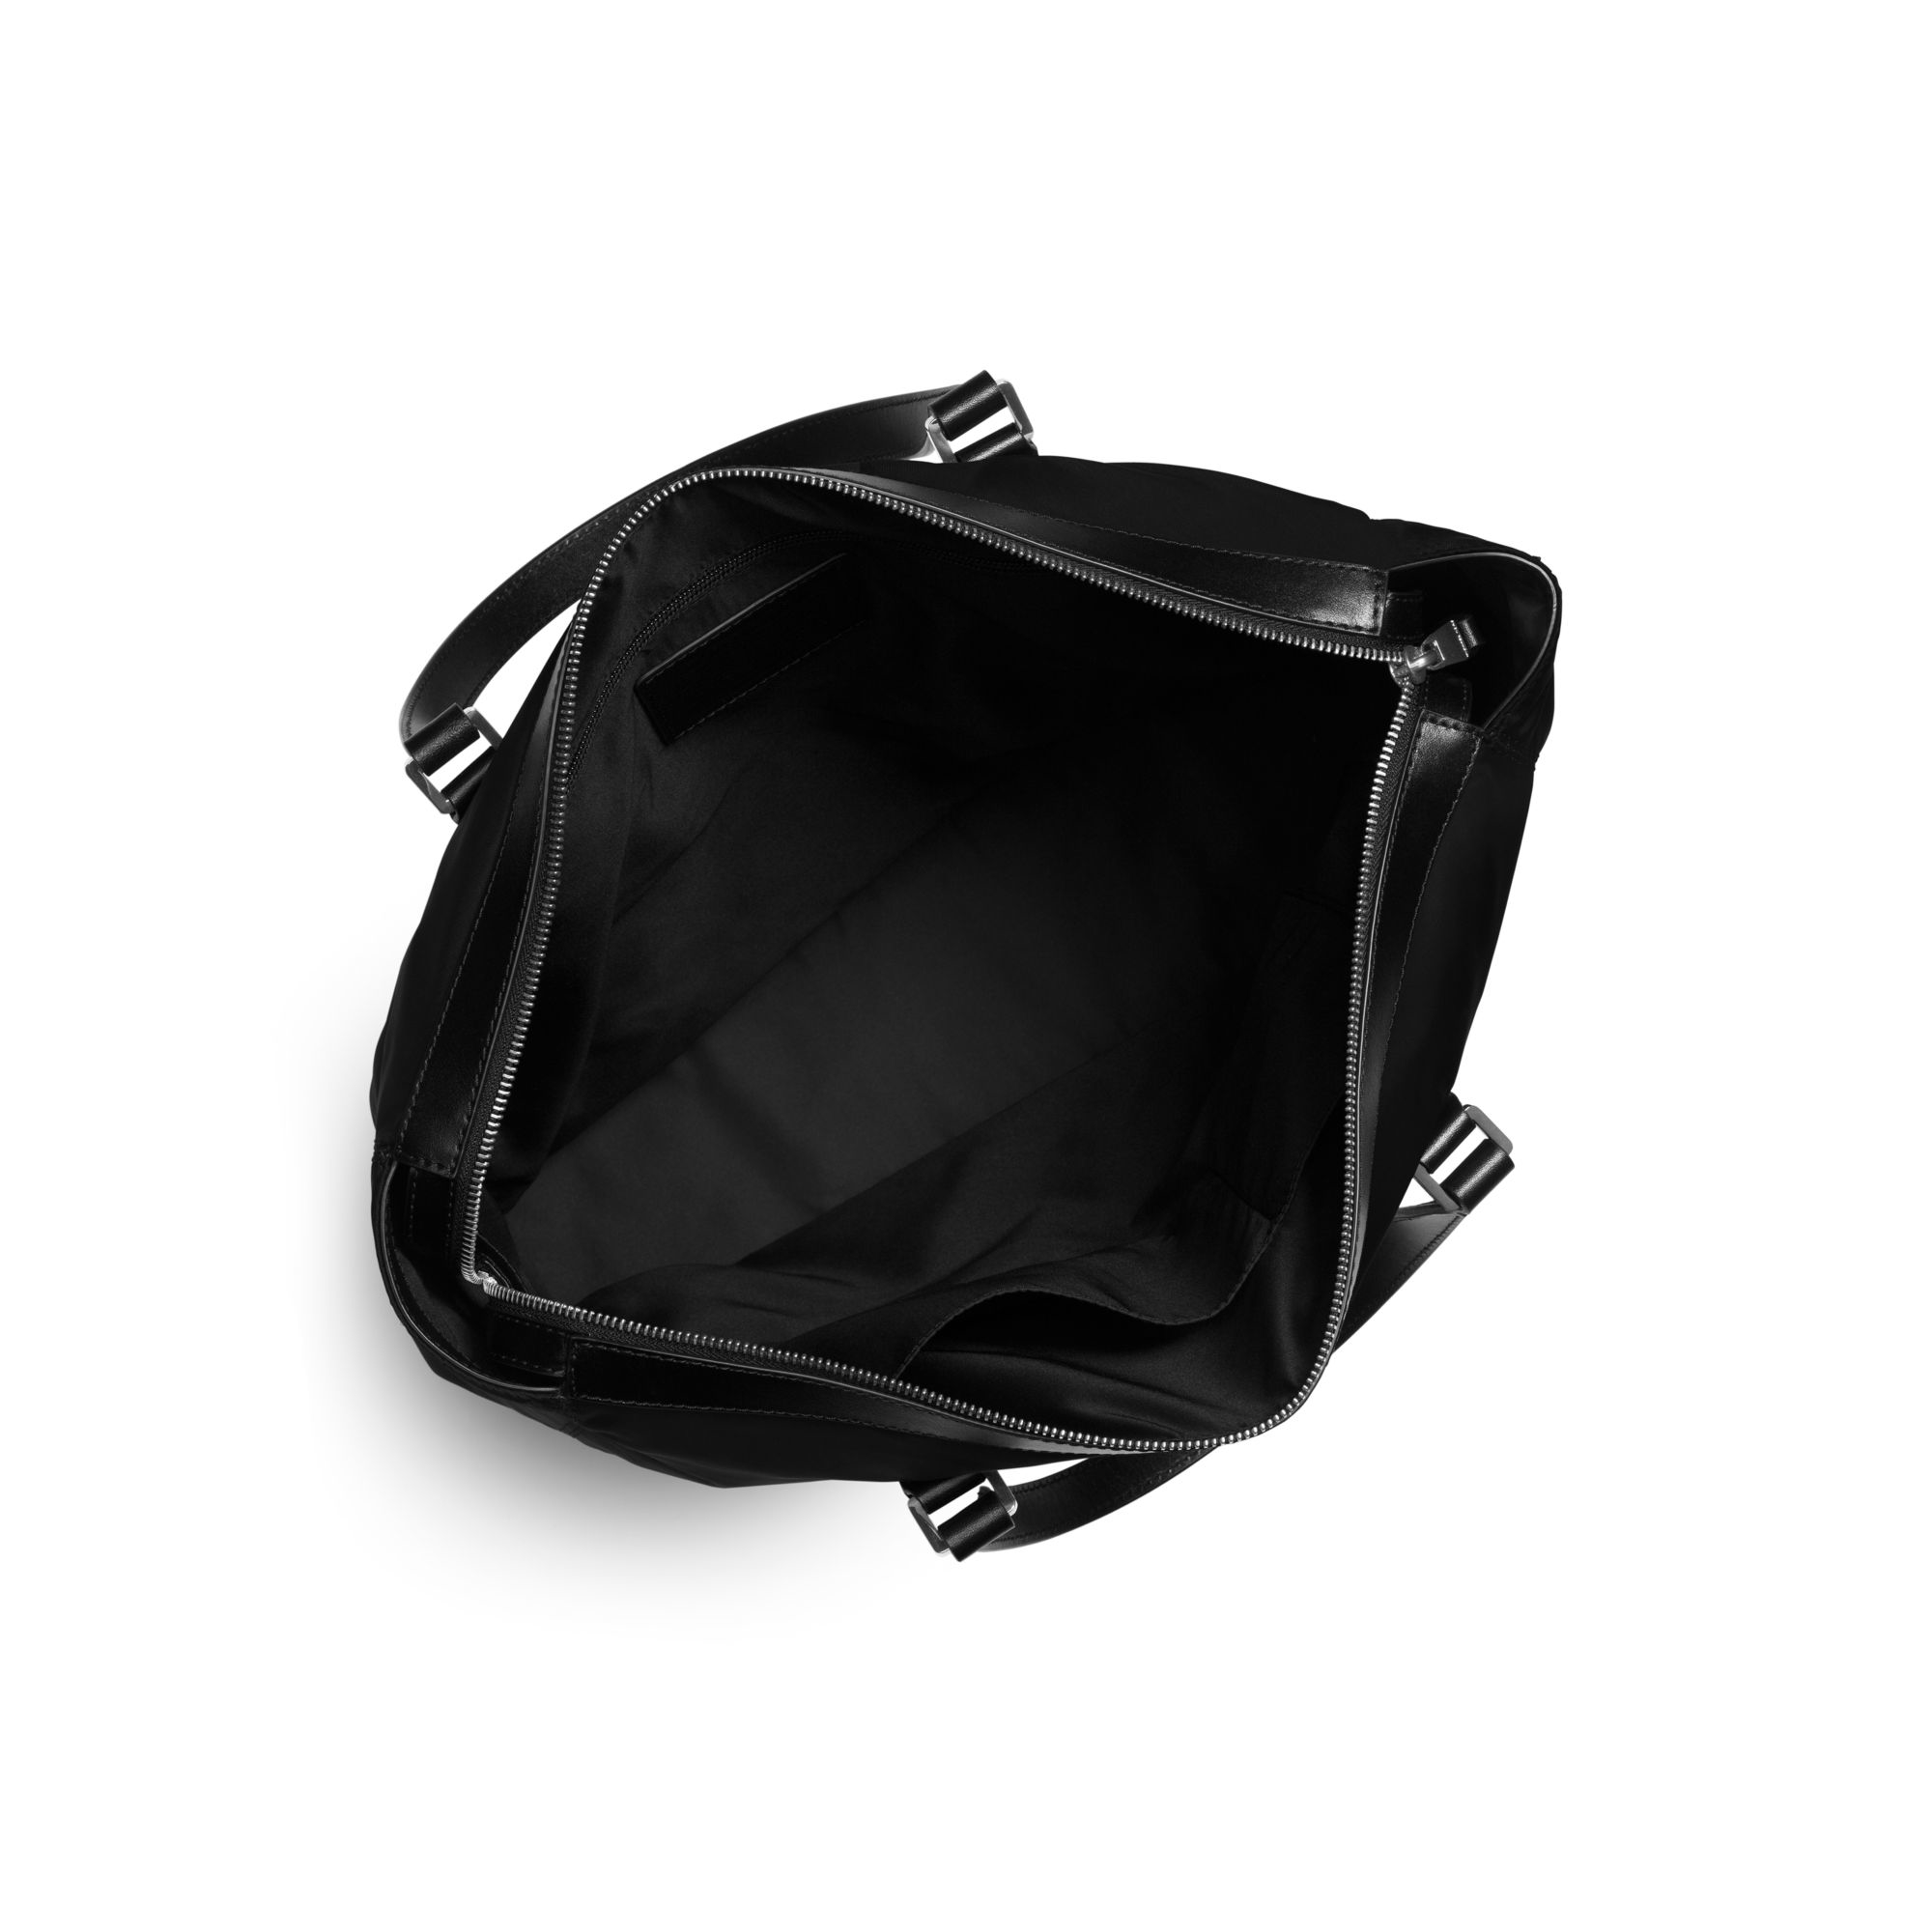 Bolsa Michael Kors Nylon : Michael kors kent large nylon tote in black for men lyst